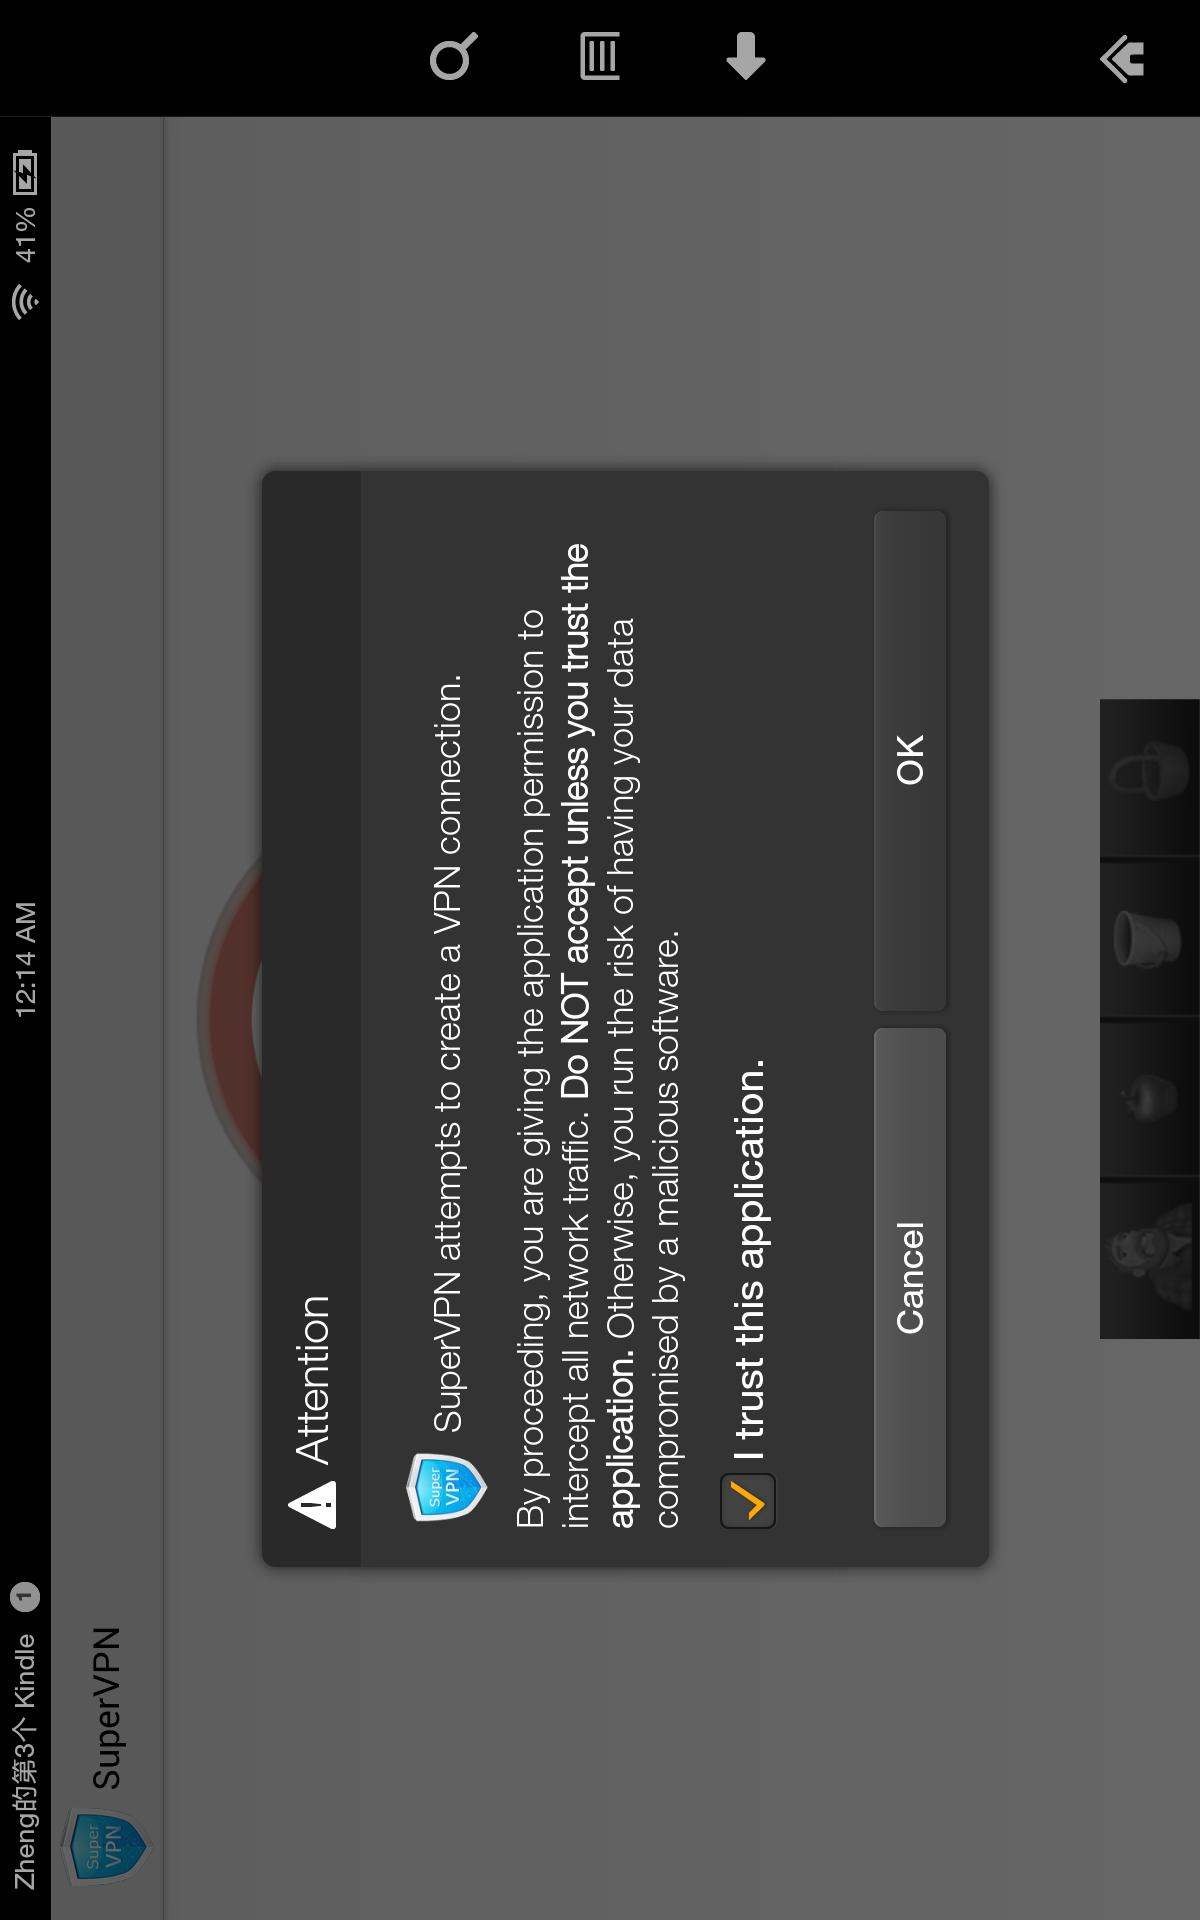 SuperVPN Free VPN Client 2.6.7 Screenshot 6